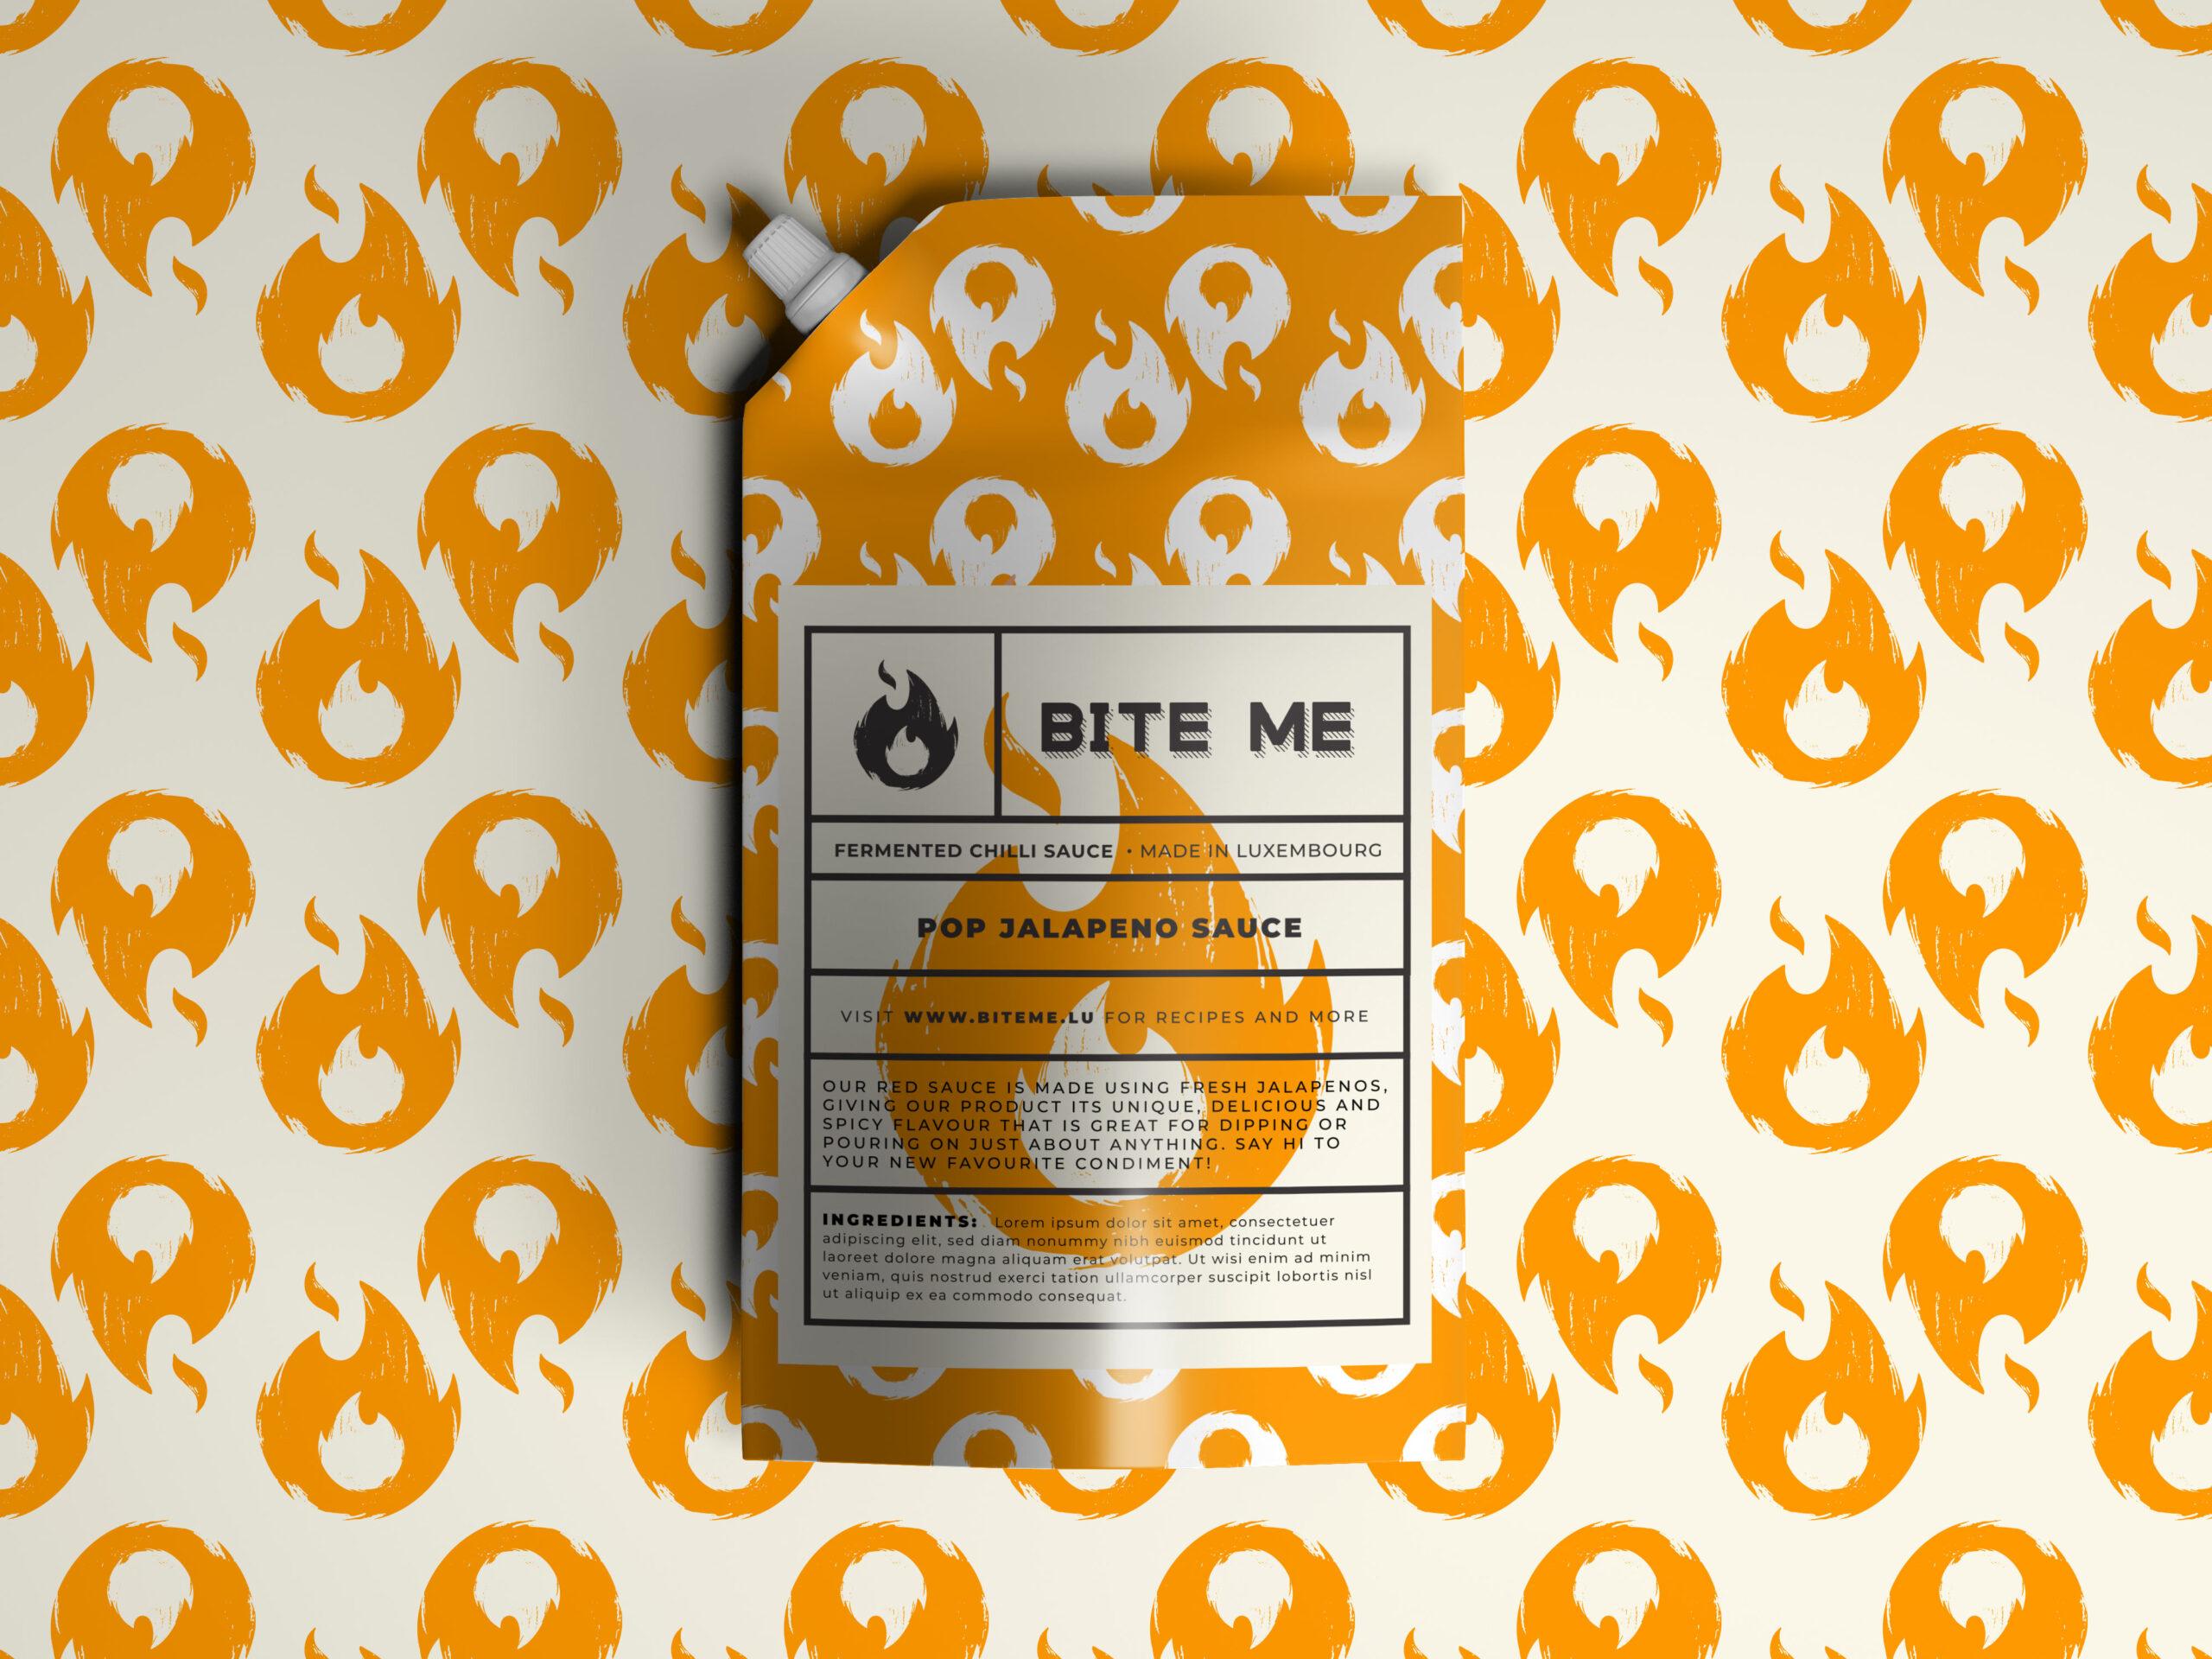 Bite Me – Luxembourg